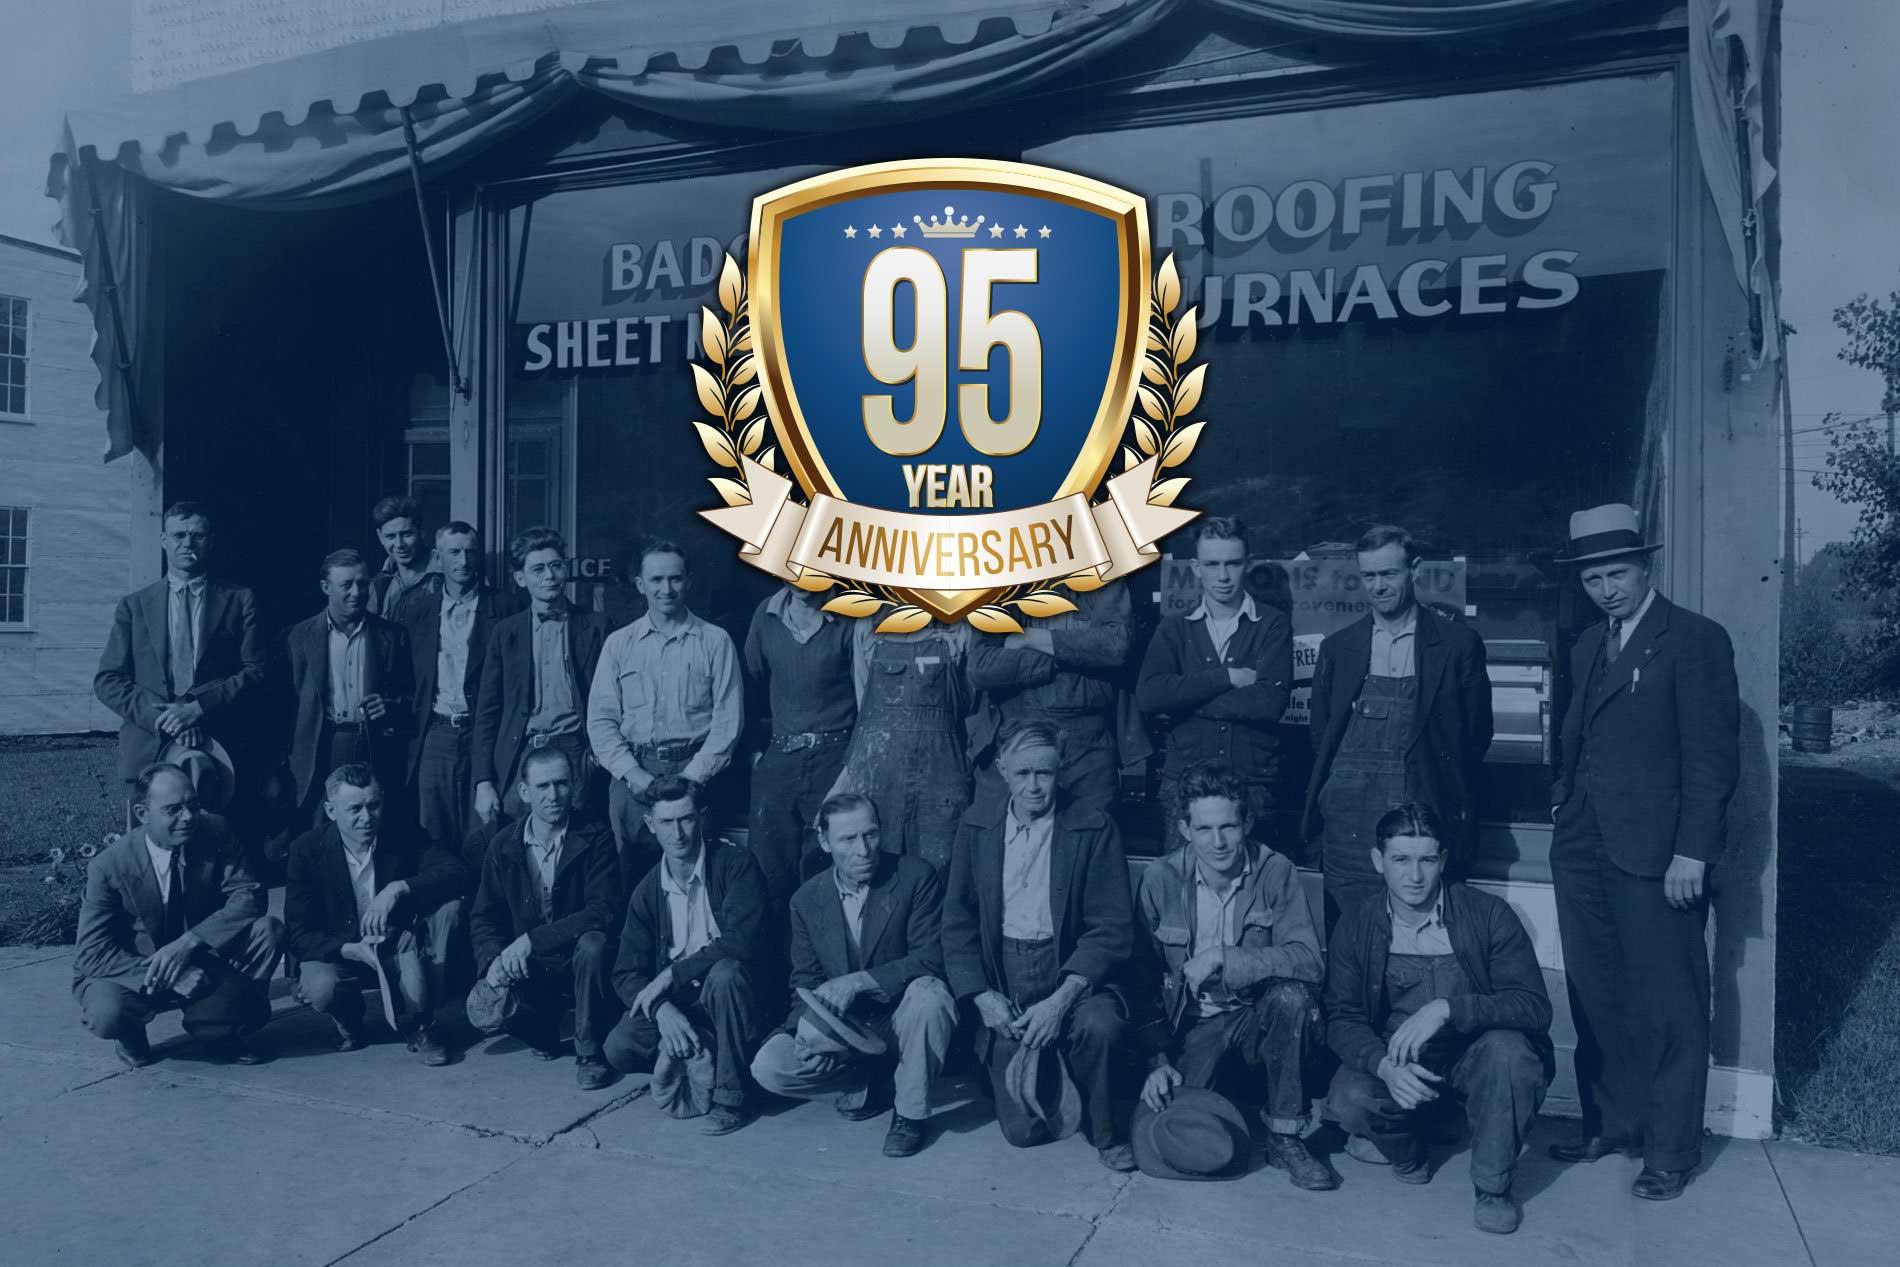 Badger Sheet Metal Works celebrates 95th anniversary